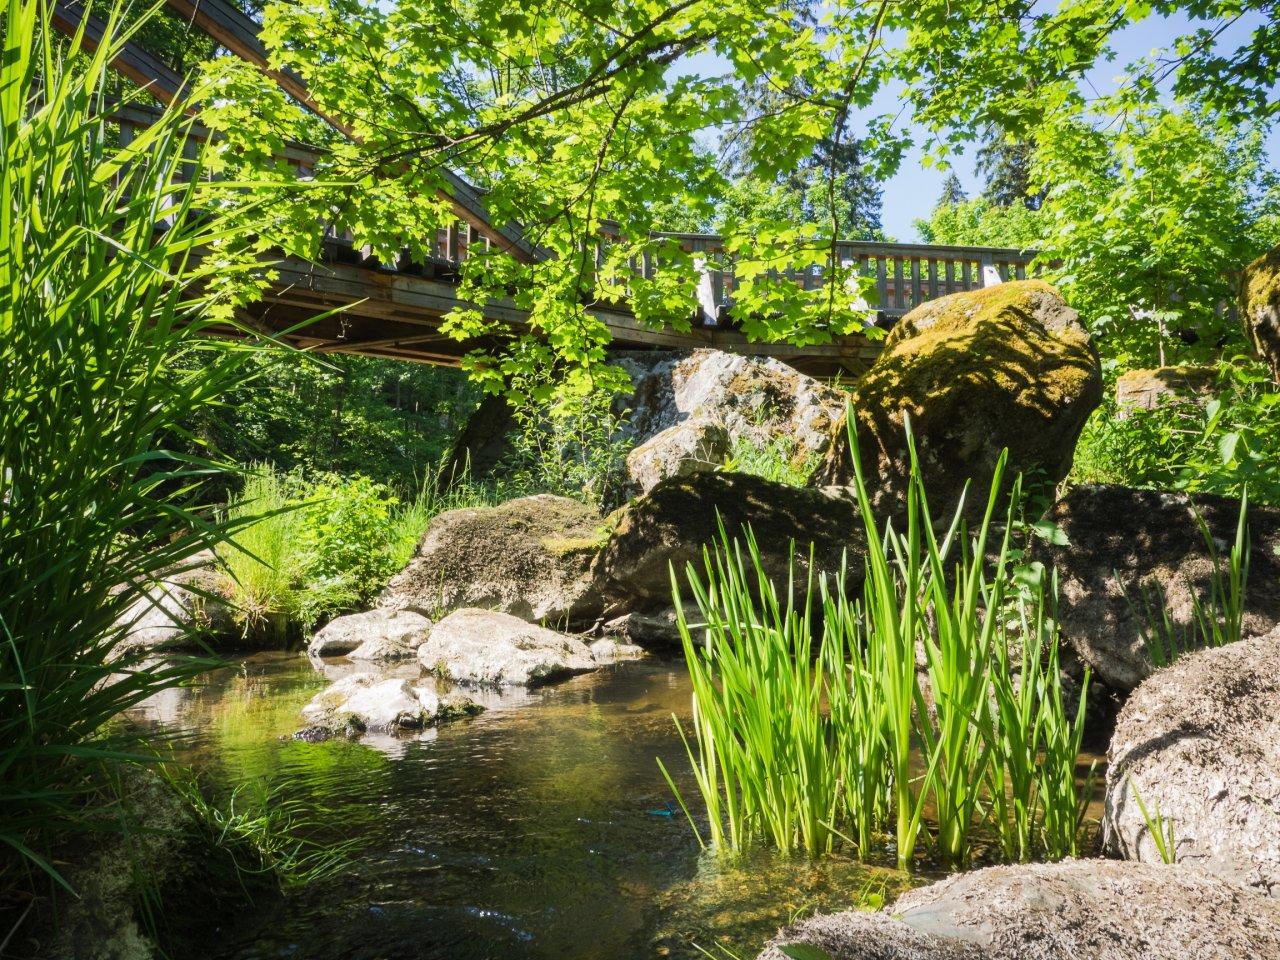 Idylle pur im Naturpark Frankenwald.